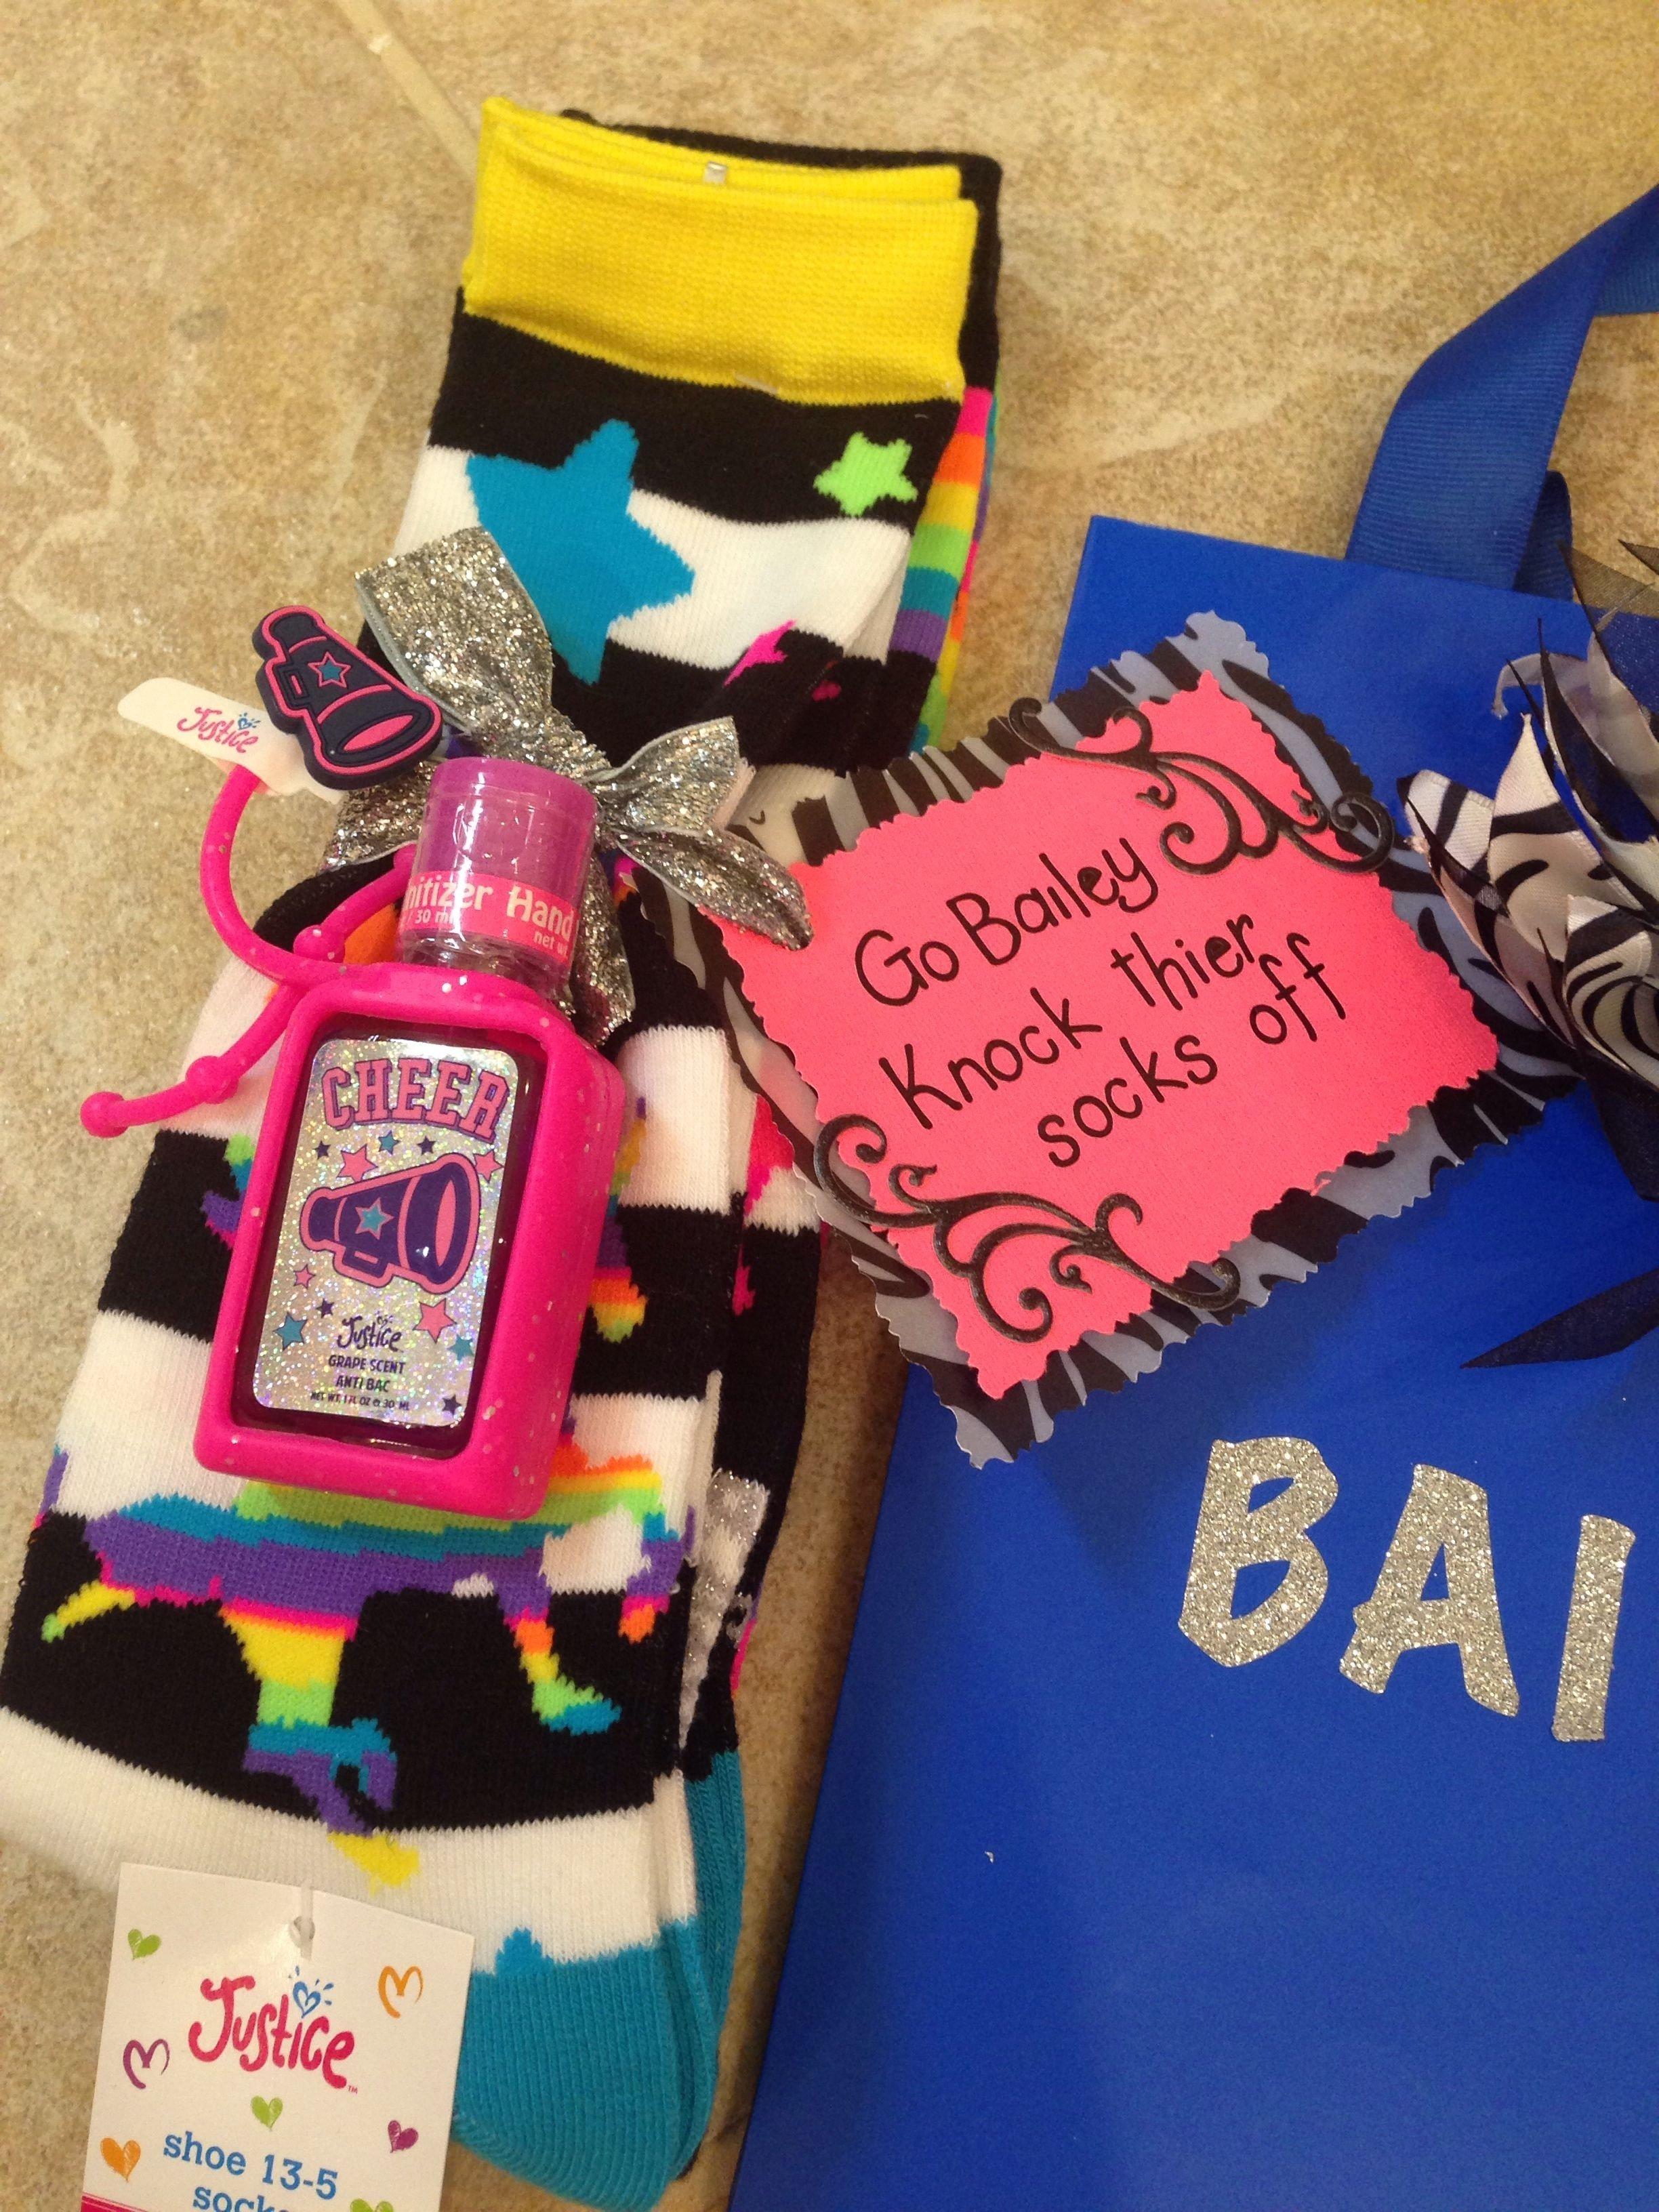 10 Nice Gift Ideas For Little Sister cheer gift ideas for big sis little sis cheerleaders dance 1 2020